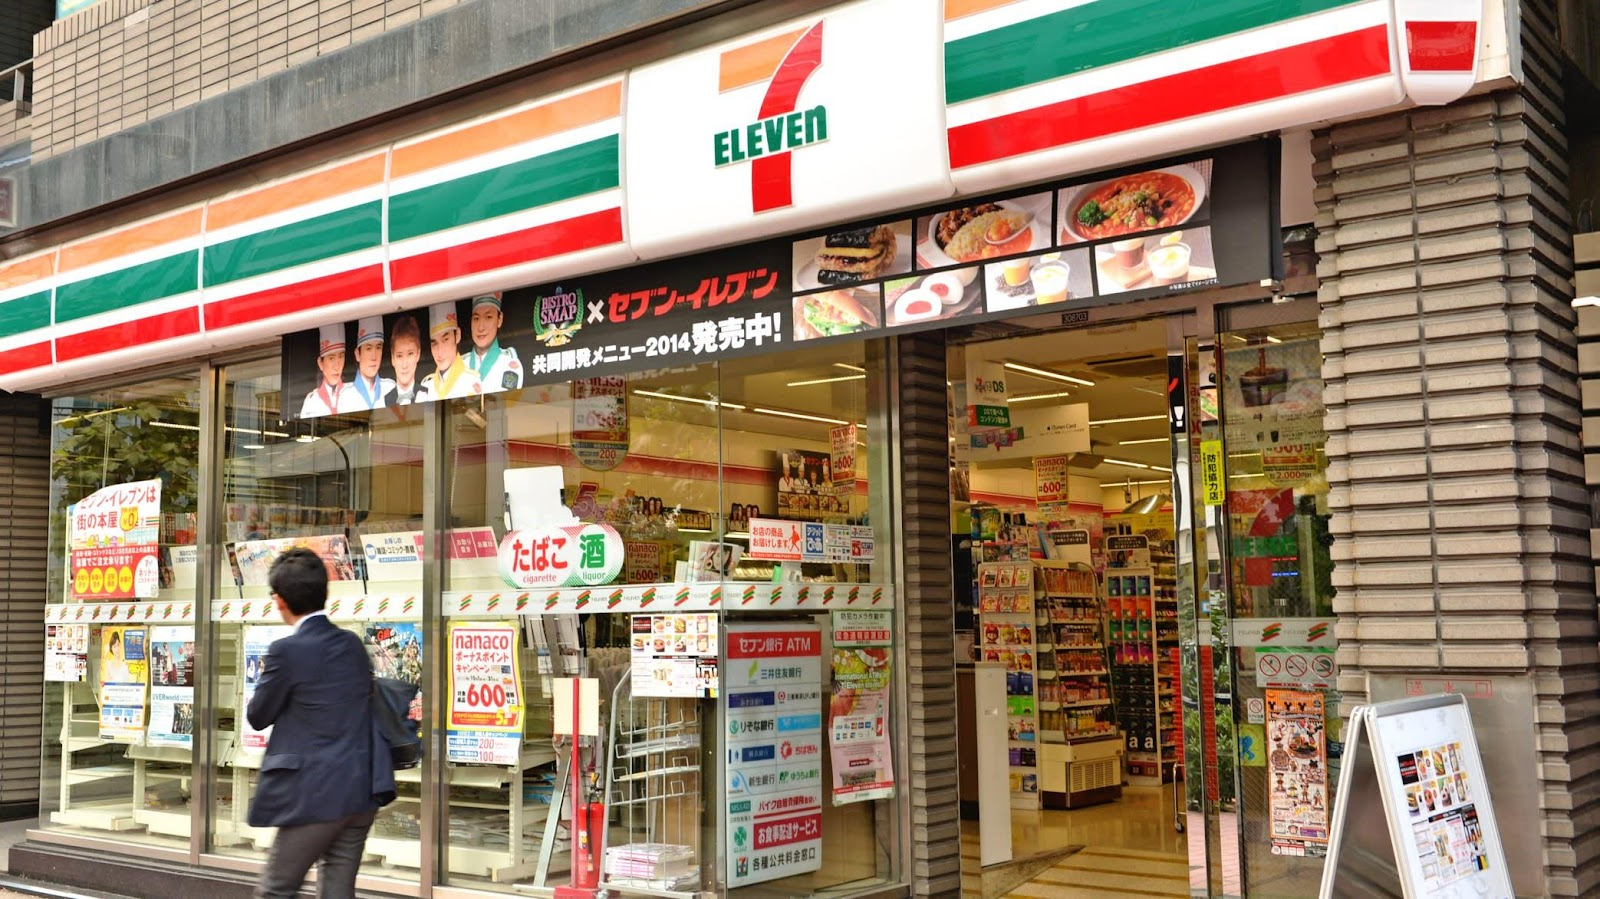 D:\i-senpai\201901\20190109\https___s3-ap-northeast-1.amazonaws.com_psh-ex-ftnikkei-3937bb4_images_2_9_1_6_686192-8-eng-GB_20170810_Seven-Eleven-store-in-Tokyo.jpg